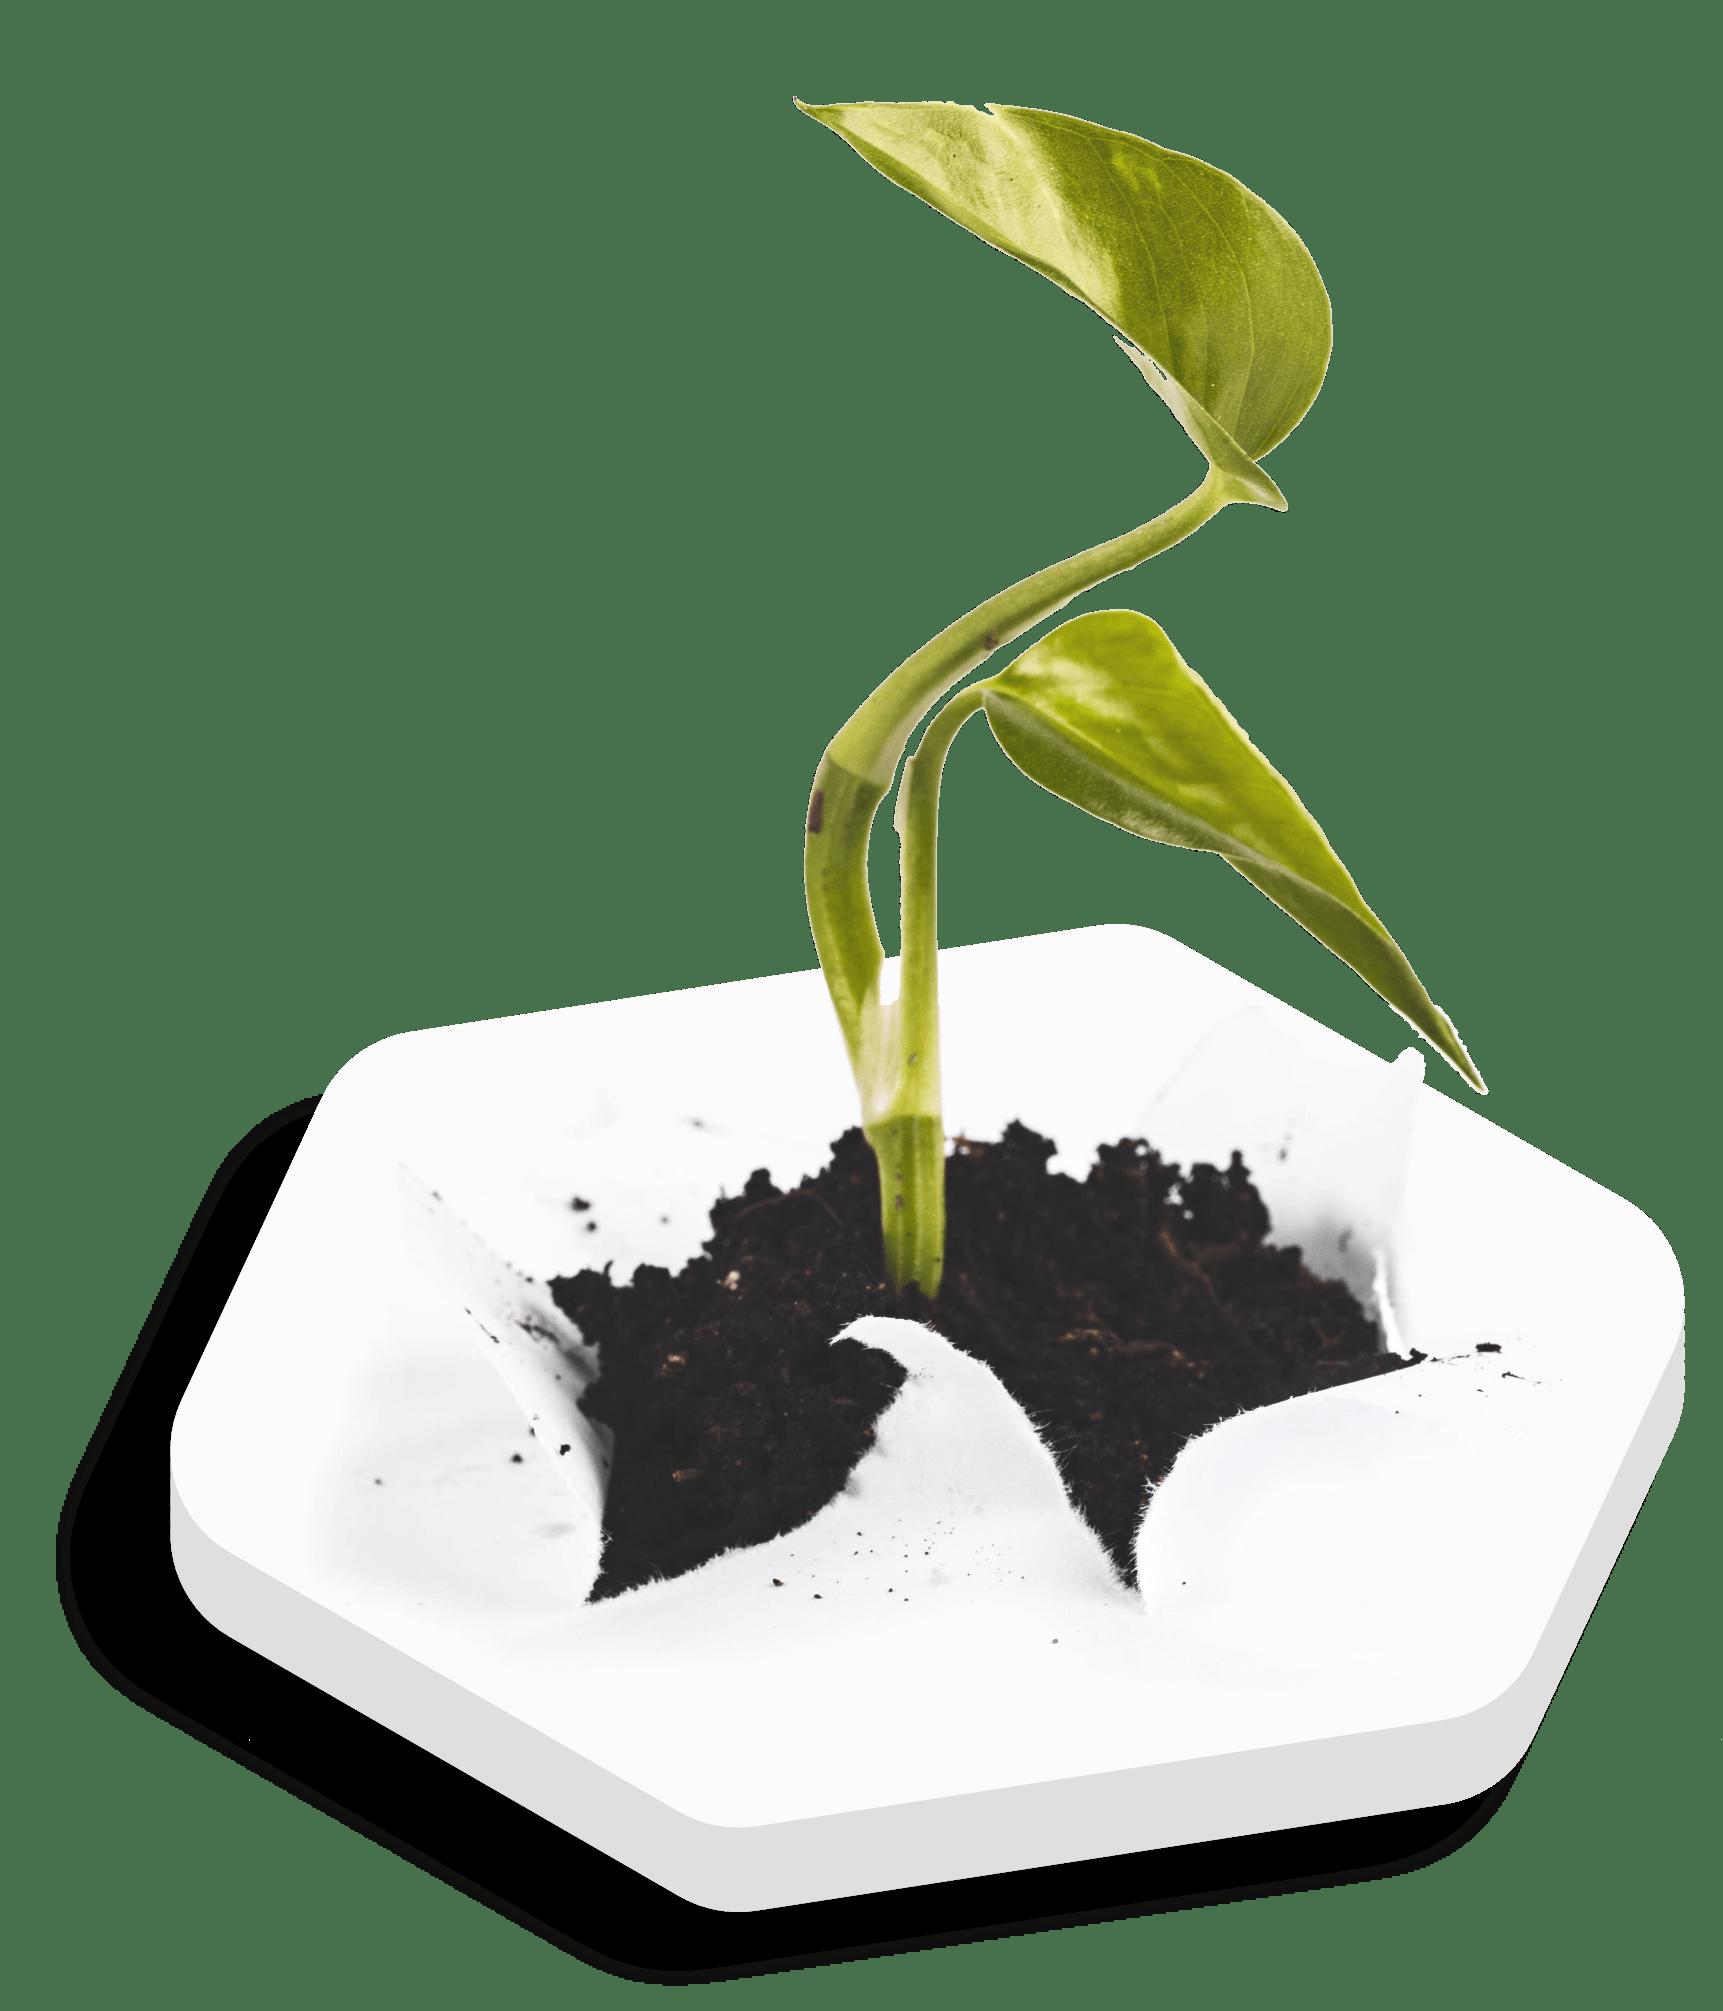 Pflanze im Wachstum